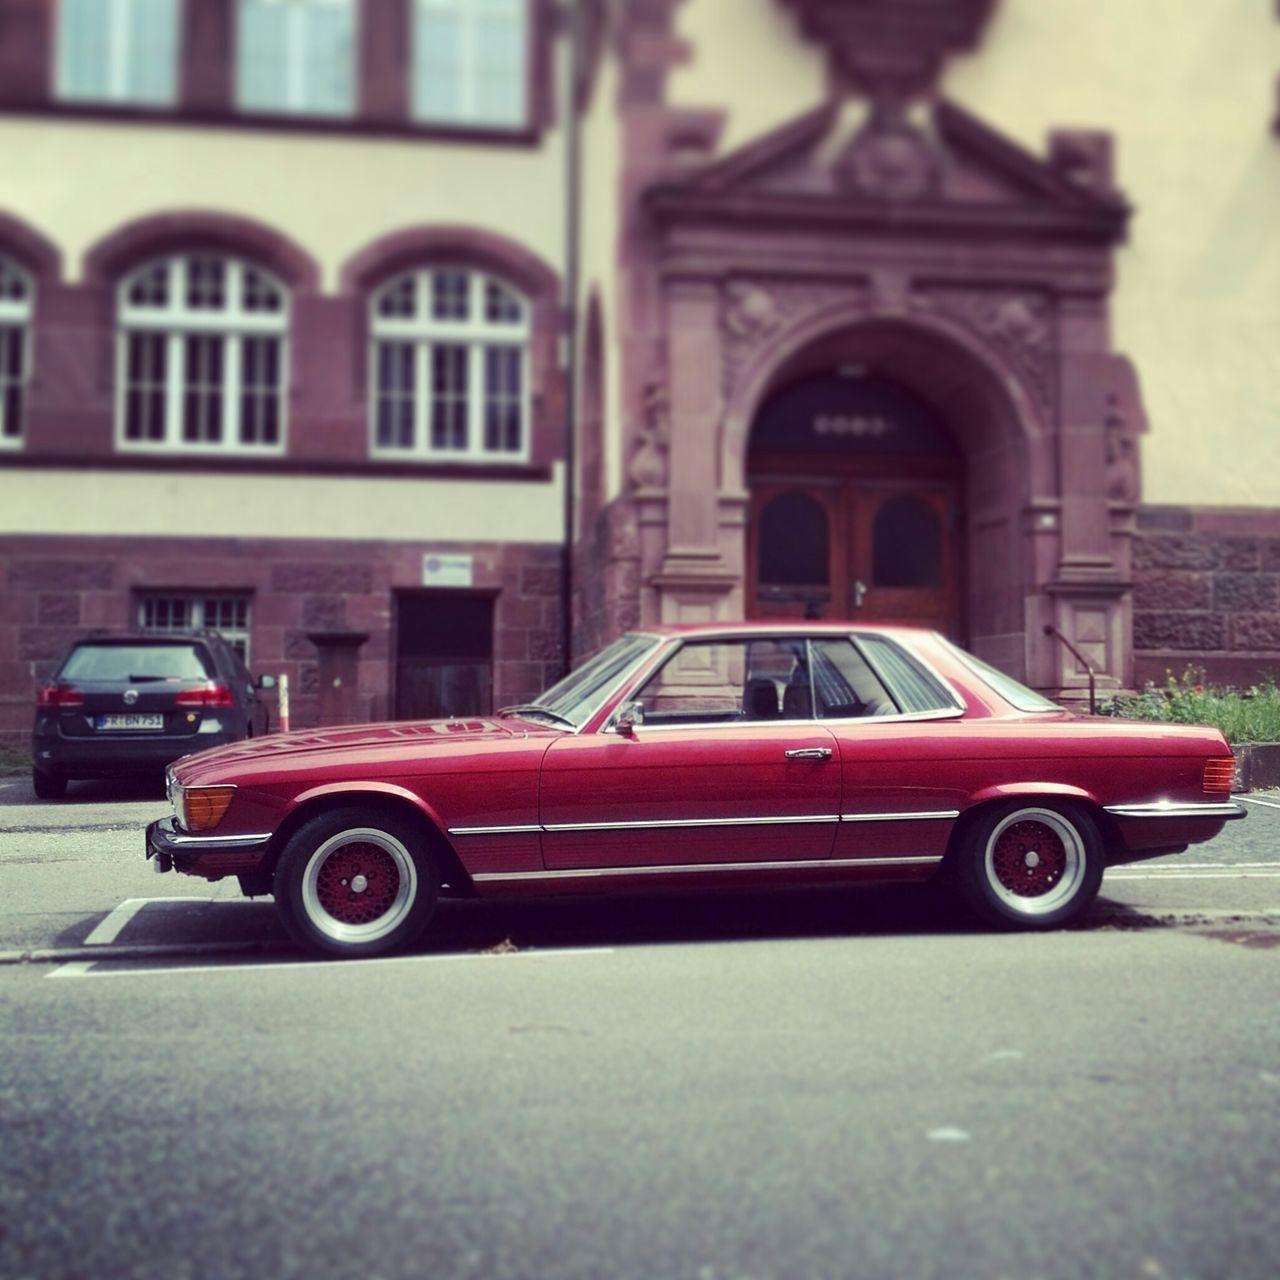 Soloparking Mercedesbenz 380sl Dreamcar Freiburg Im Breisgau Freiburg Mercedes Benz 380 Classic Car V8 Mercedes Benz